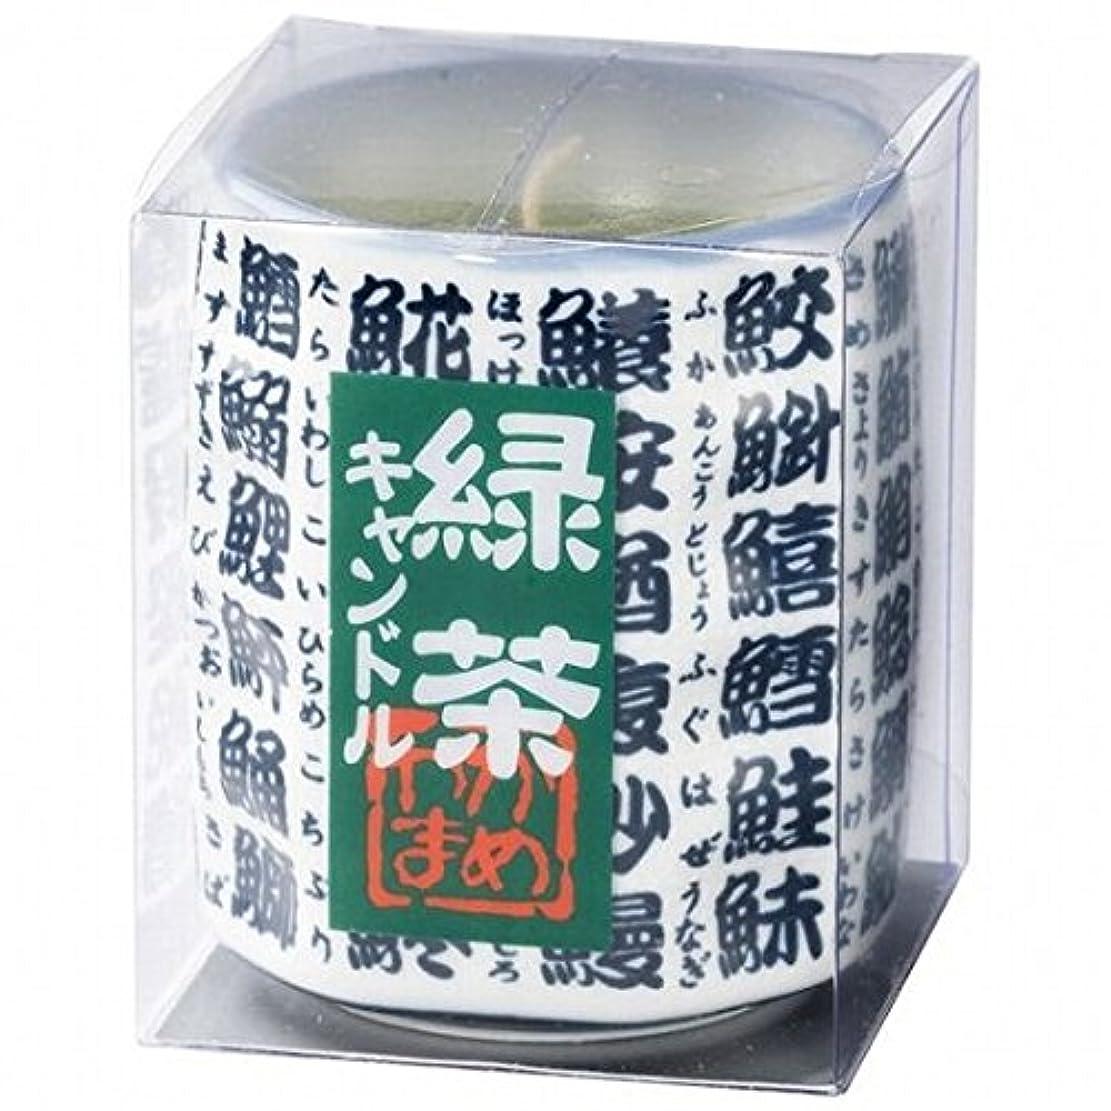 kameyama candle(カメヤマキャンドル) 緑茶キャンドル(86070000)